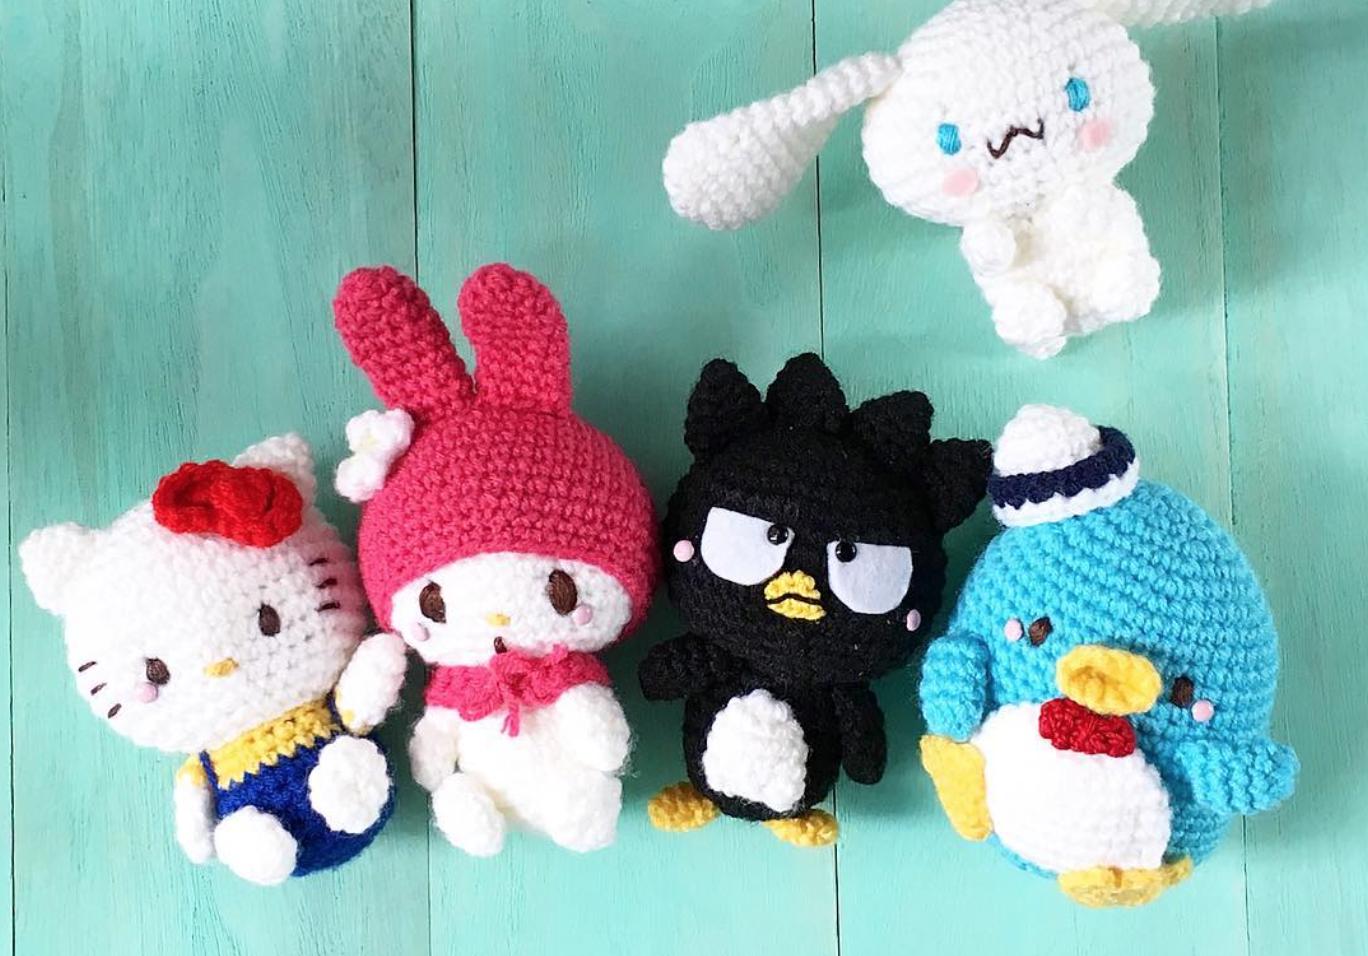 60ba0764e Hello Kitty Amigurumi Inspiration Photos & How to Create Your Own  Crocheted Hello Kitty Dolls